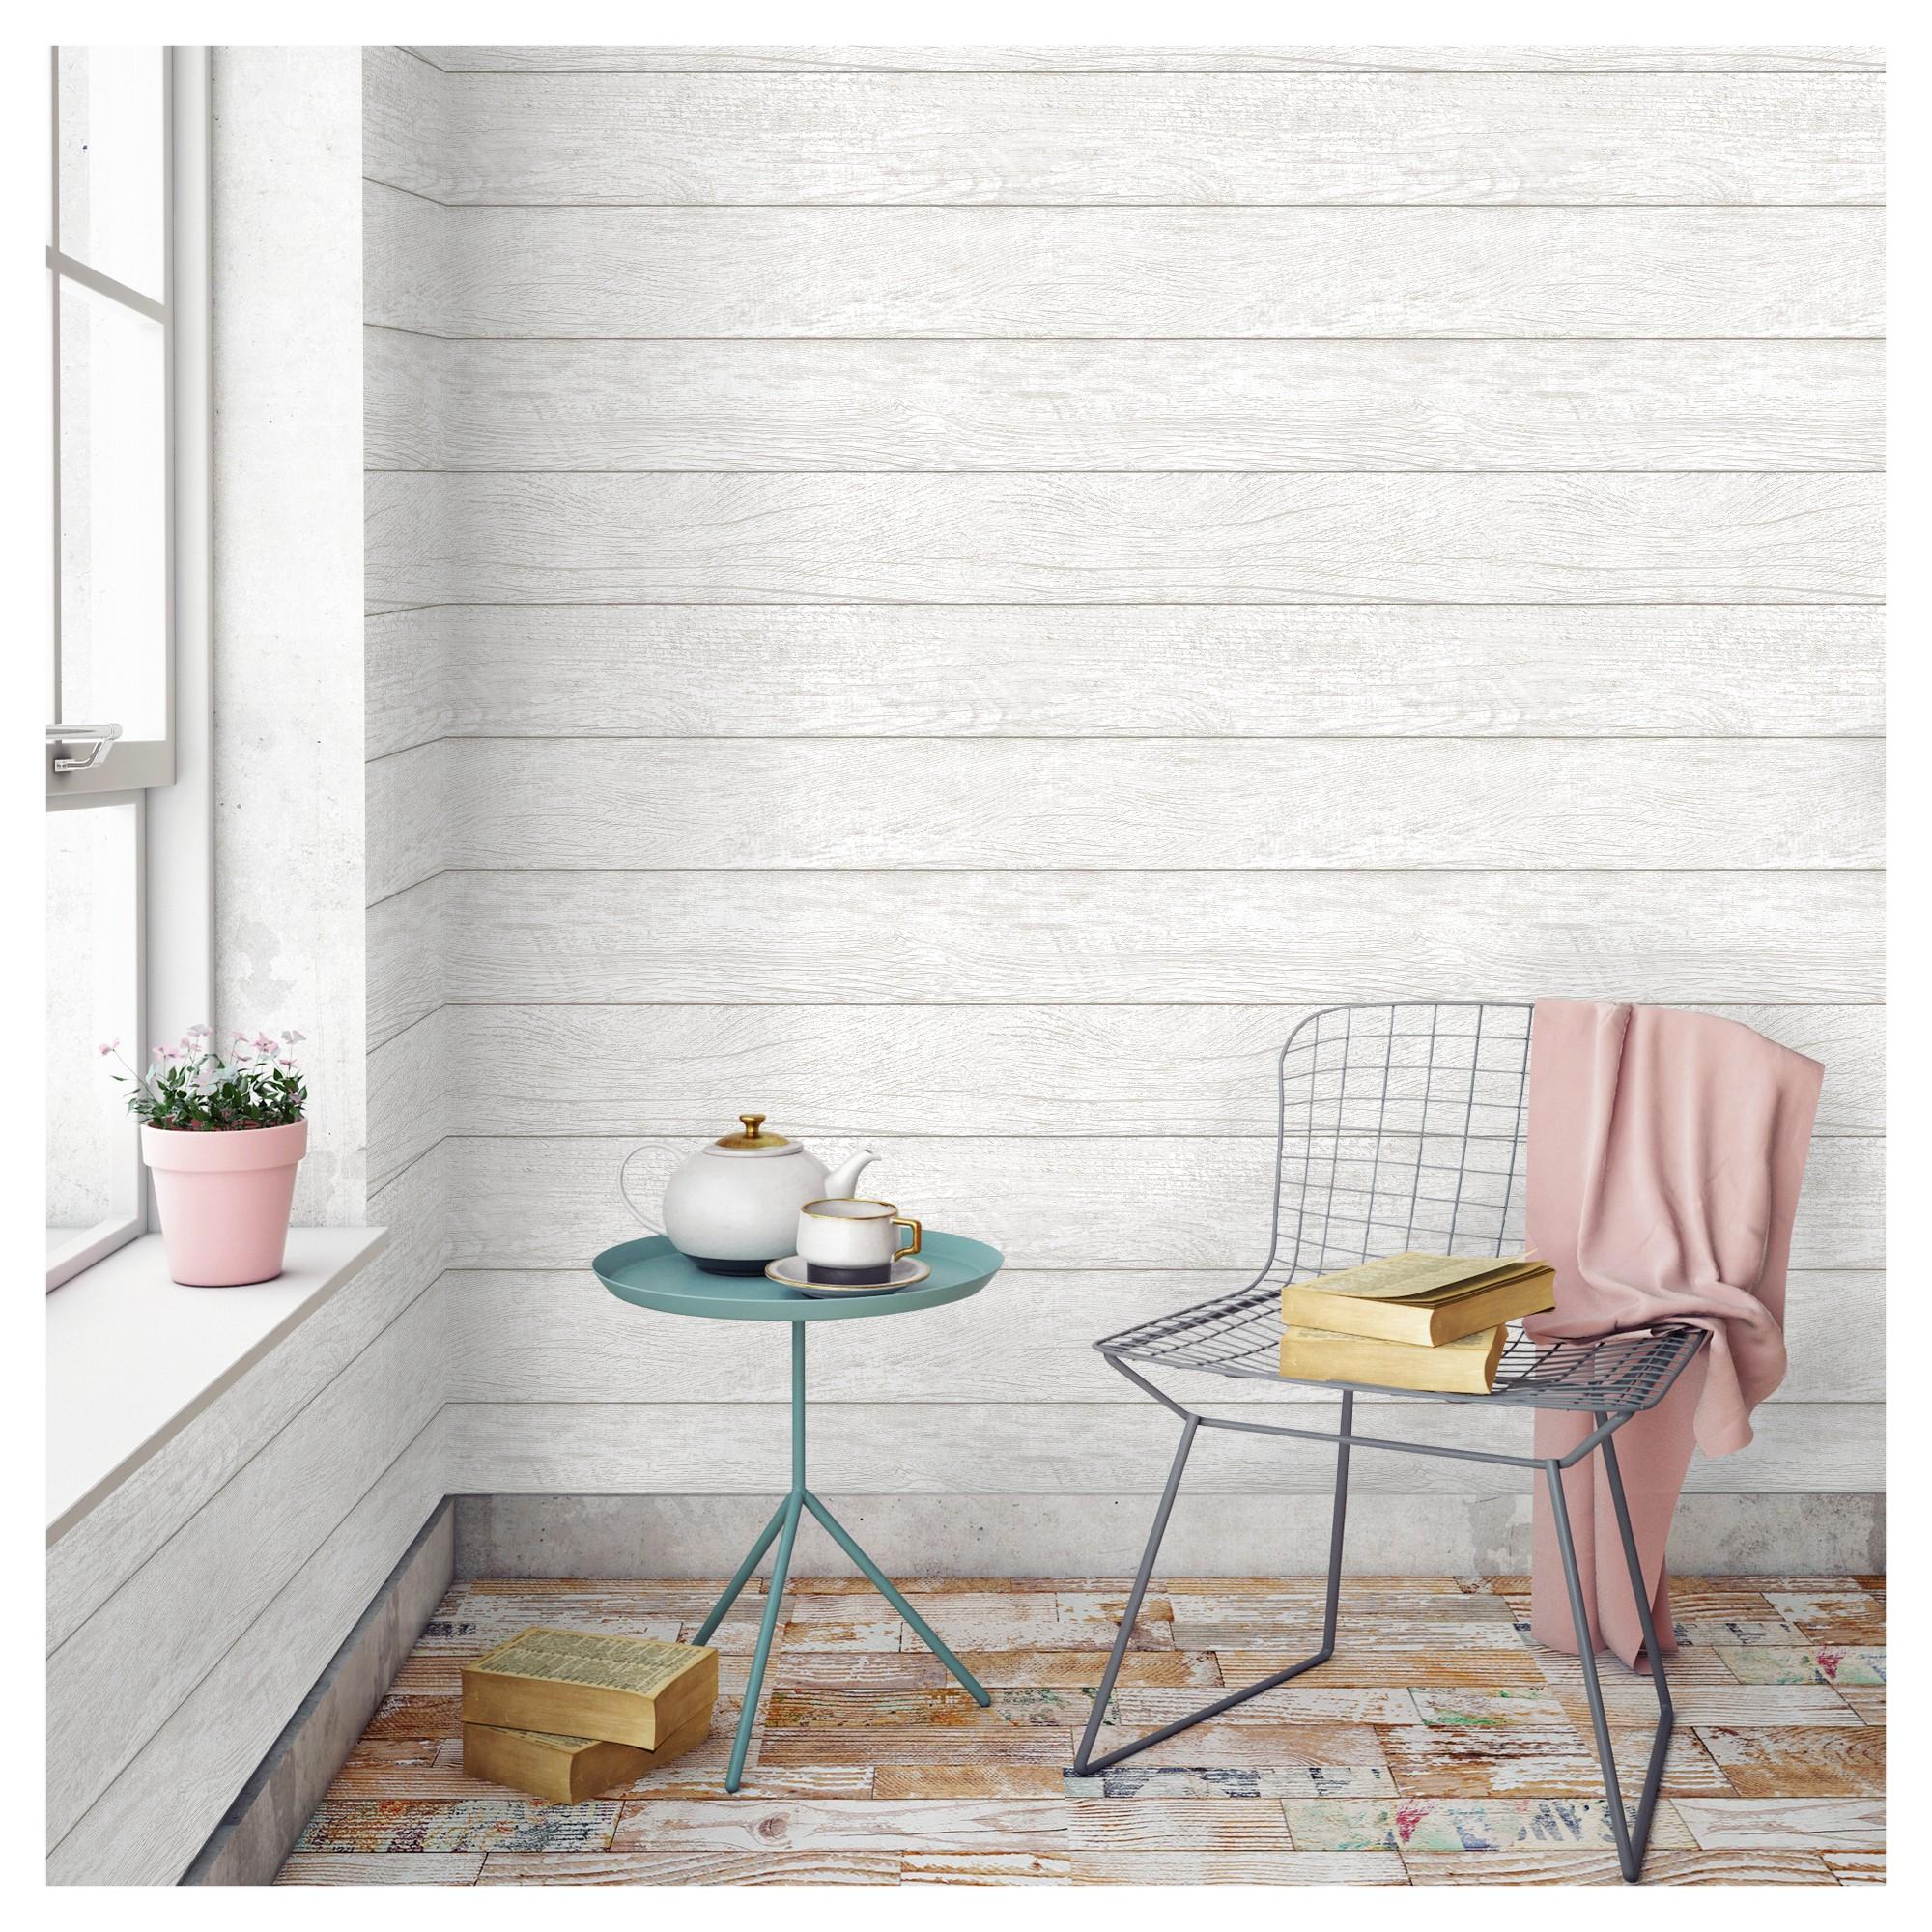 Devine Color Textured Shiplap Peel & Stick Wallpaper